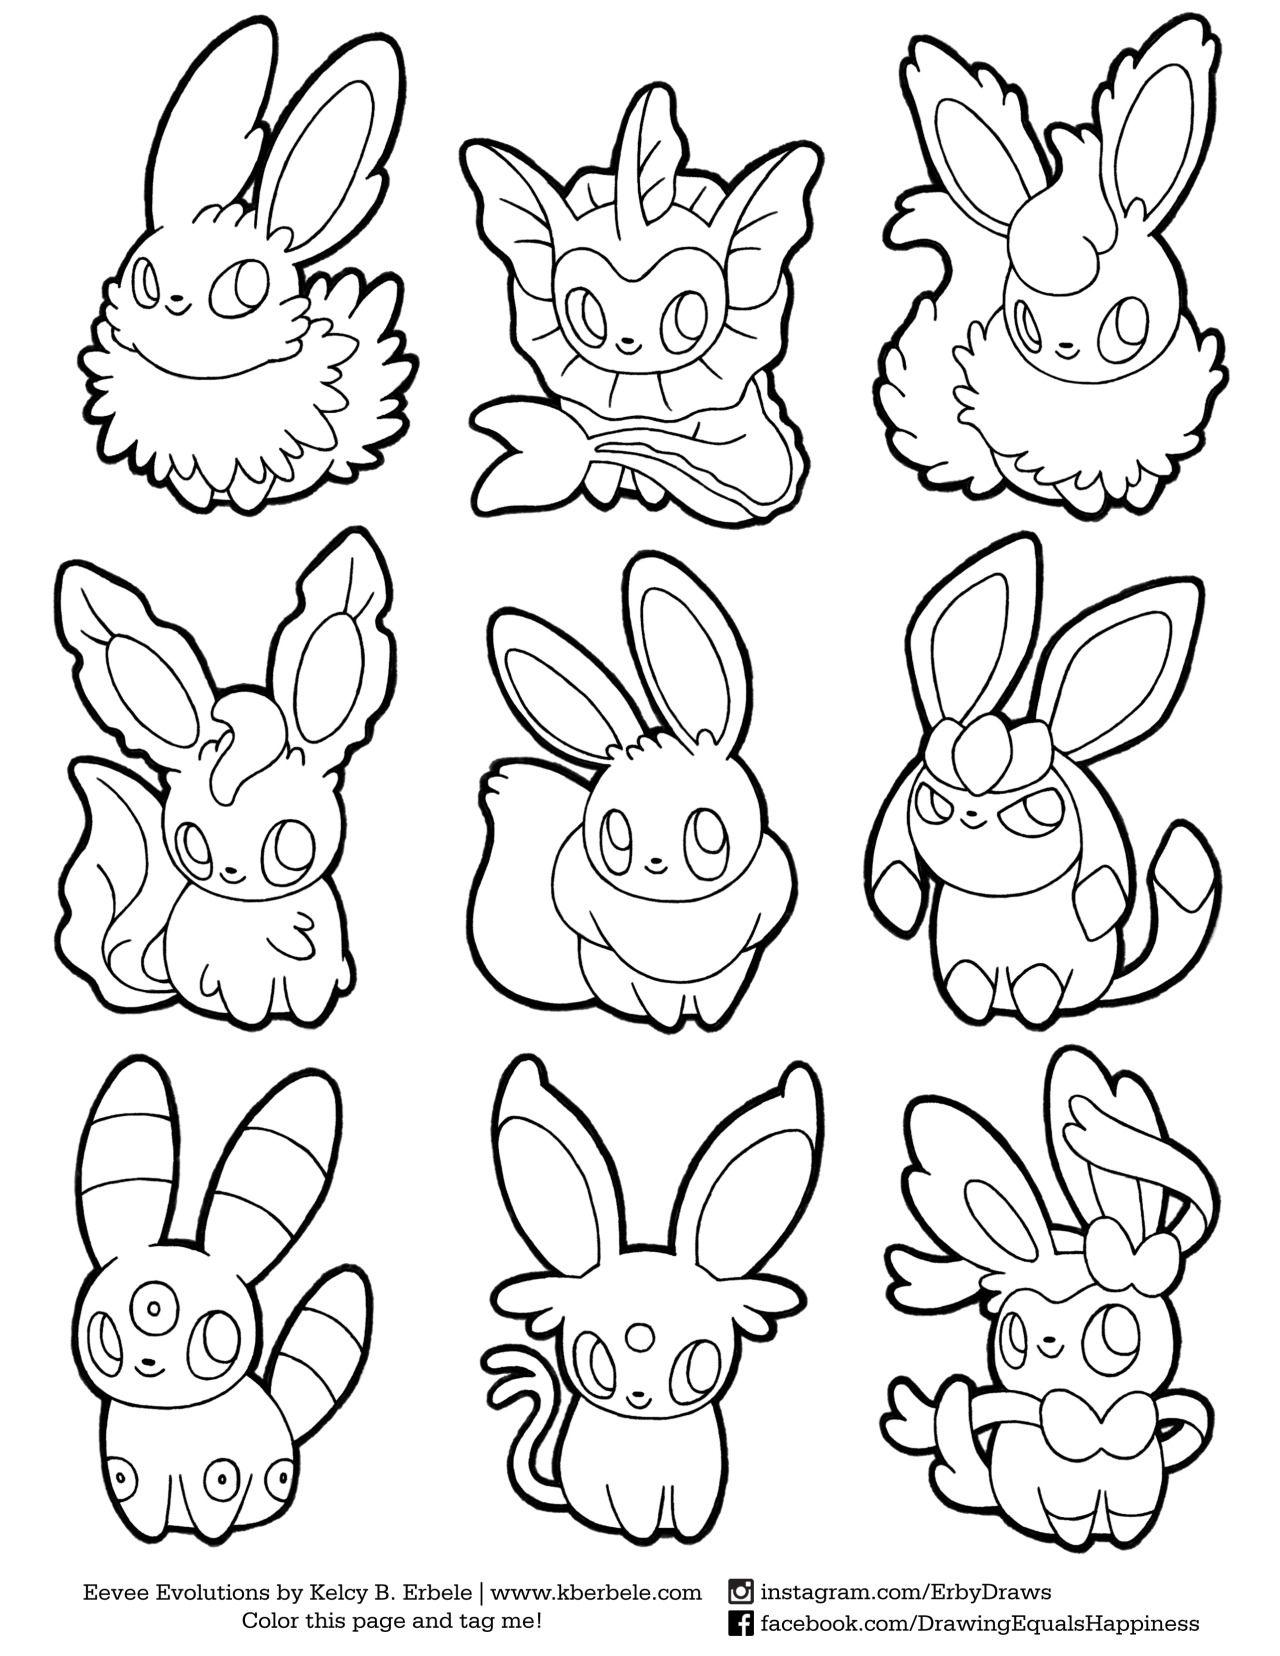 Frais Dessin A Imprimer Pokemon Tauros